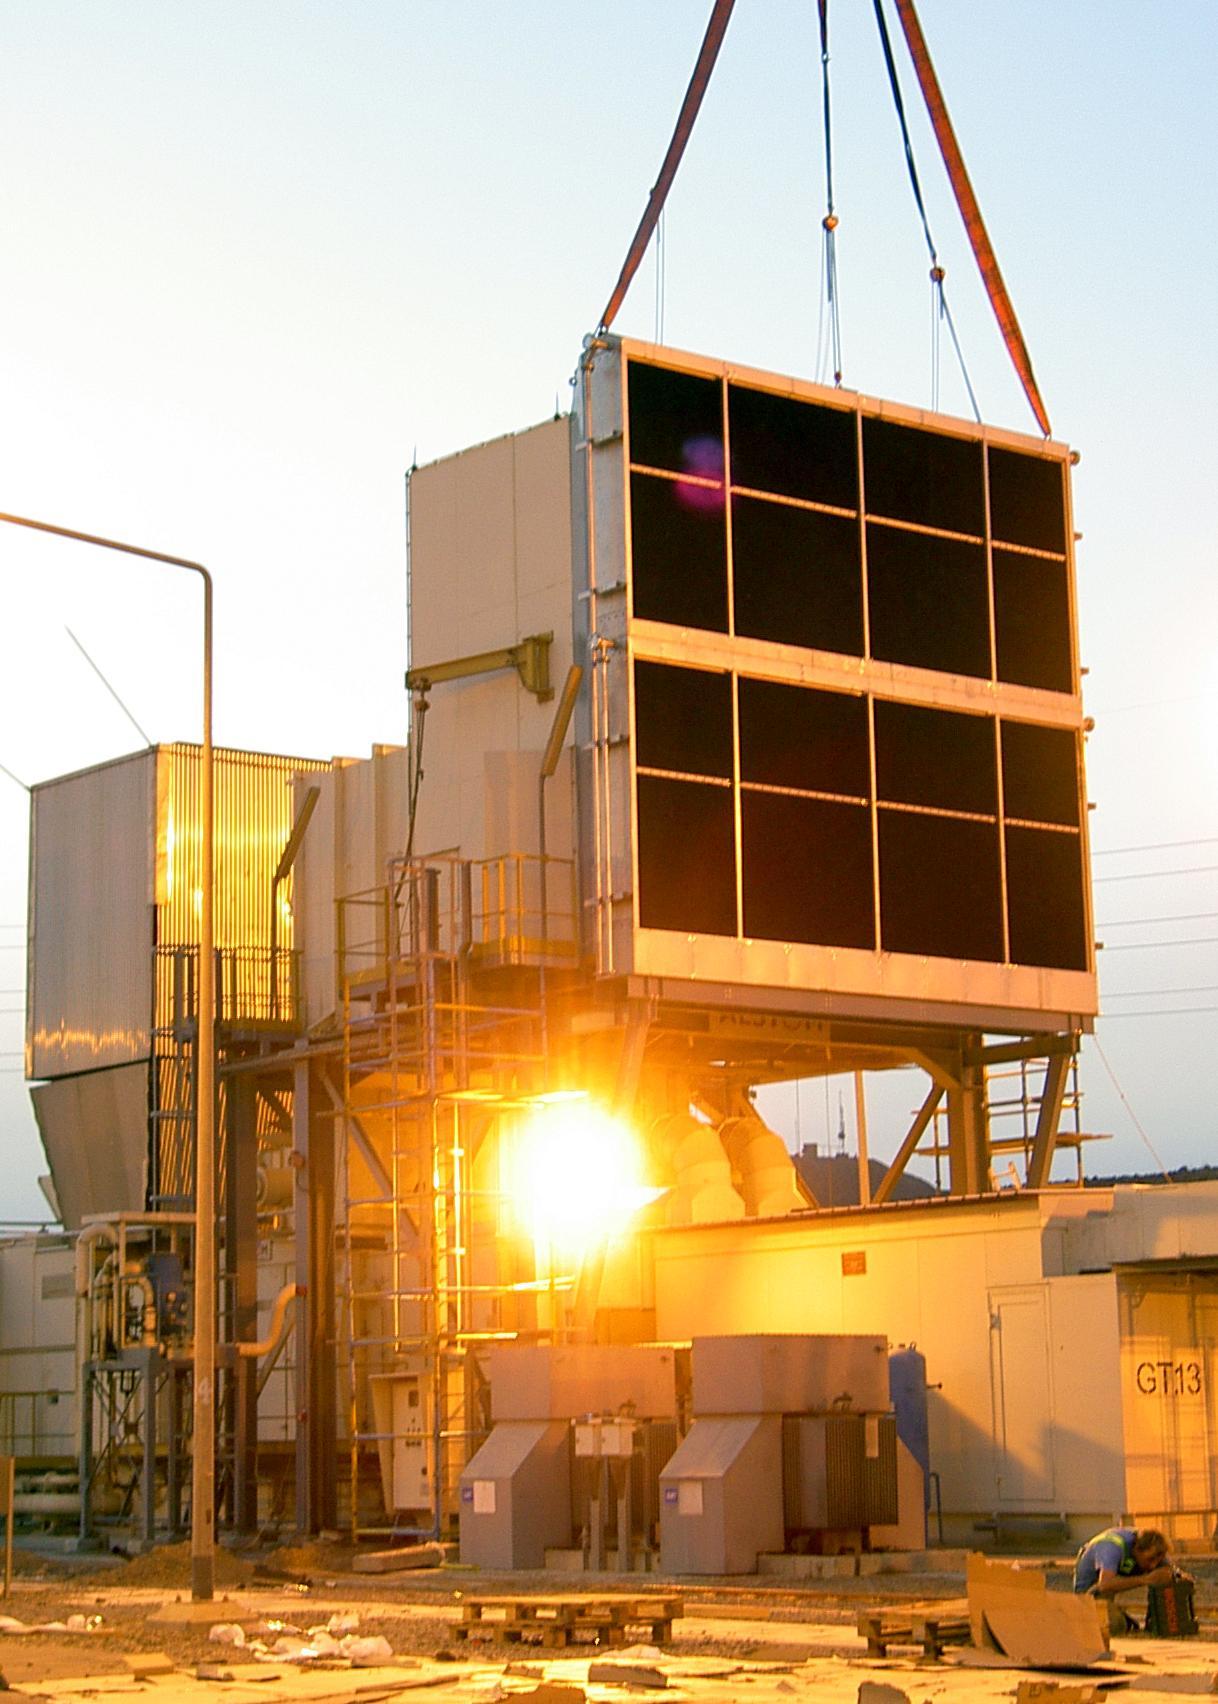 Installation of Munters evaporative air coolers